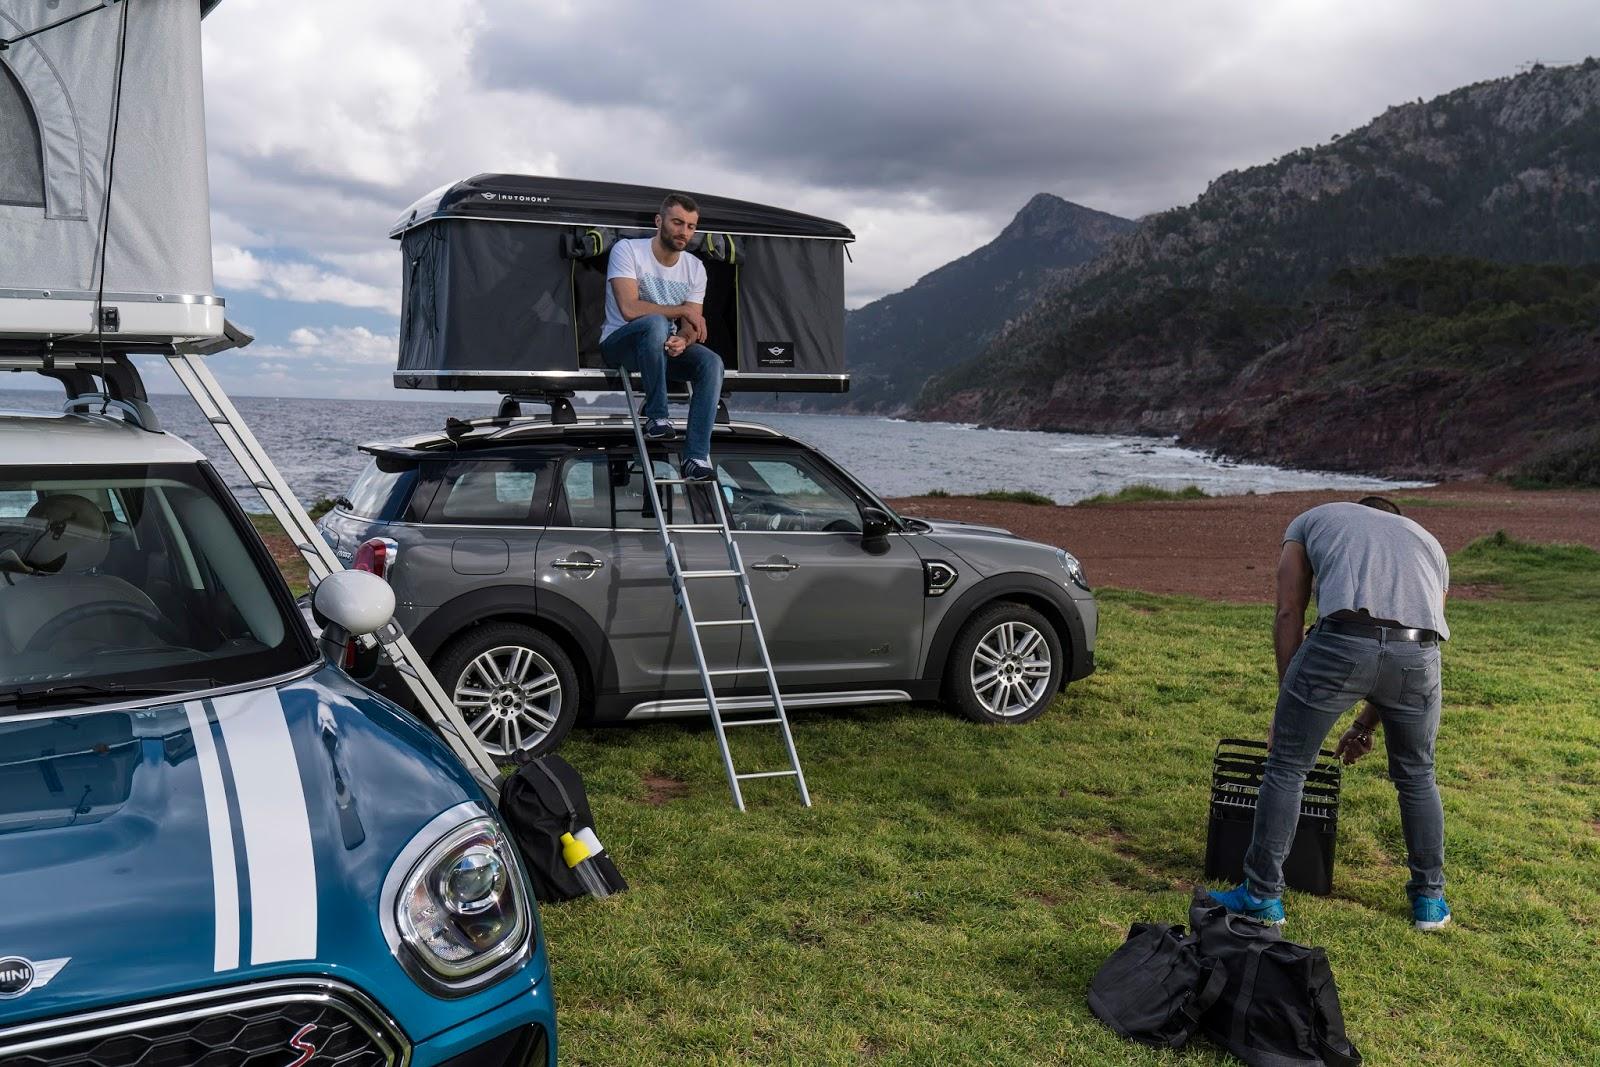 P90258007 highRes the autohome roof te Το MINI Countryman έχει και... σκηνή οροφής Mini, MINI Cooper Countryman, SUV